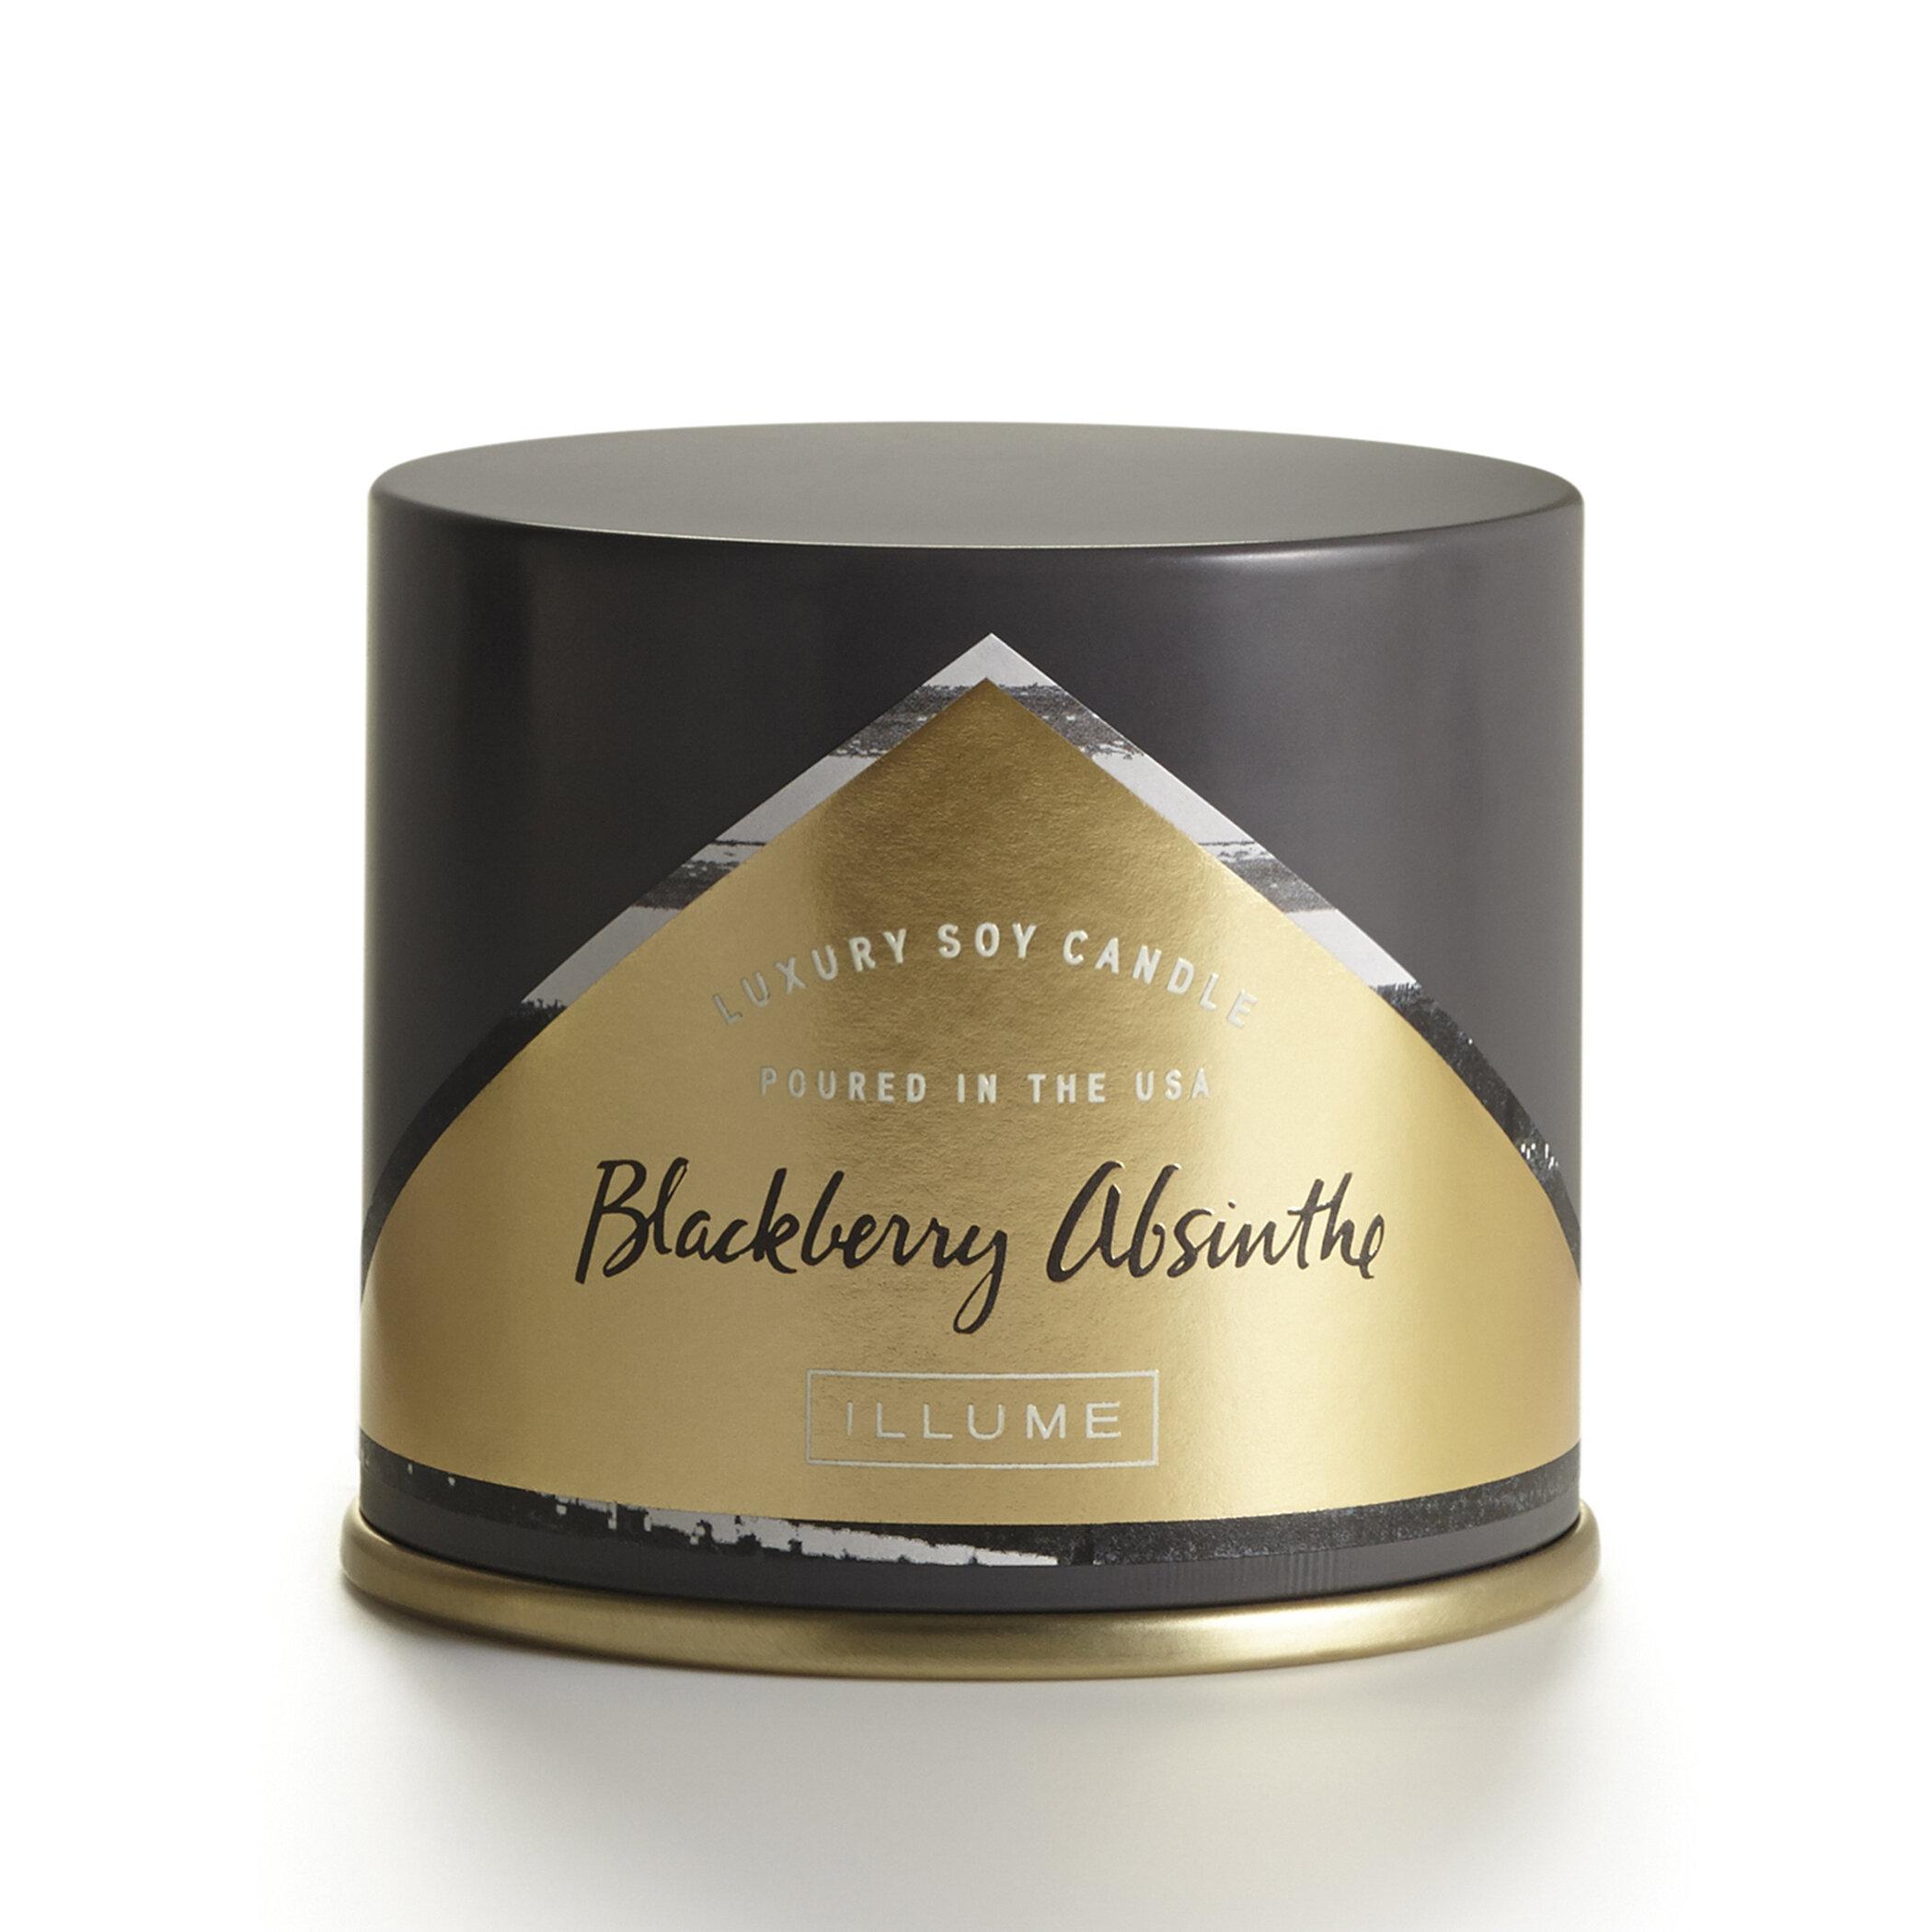 Illume Essentials Vanity Tin Blackberry Absinthe Scented Jar Candle Wayfair